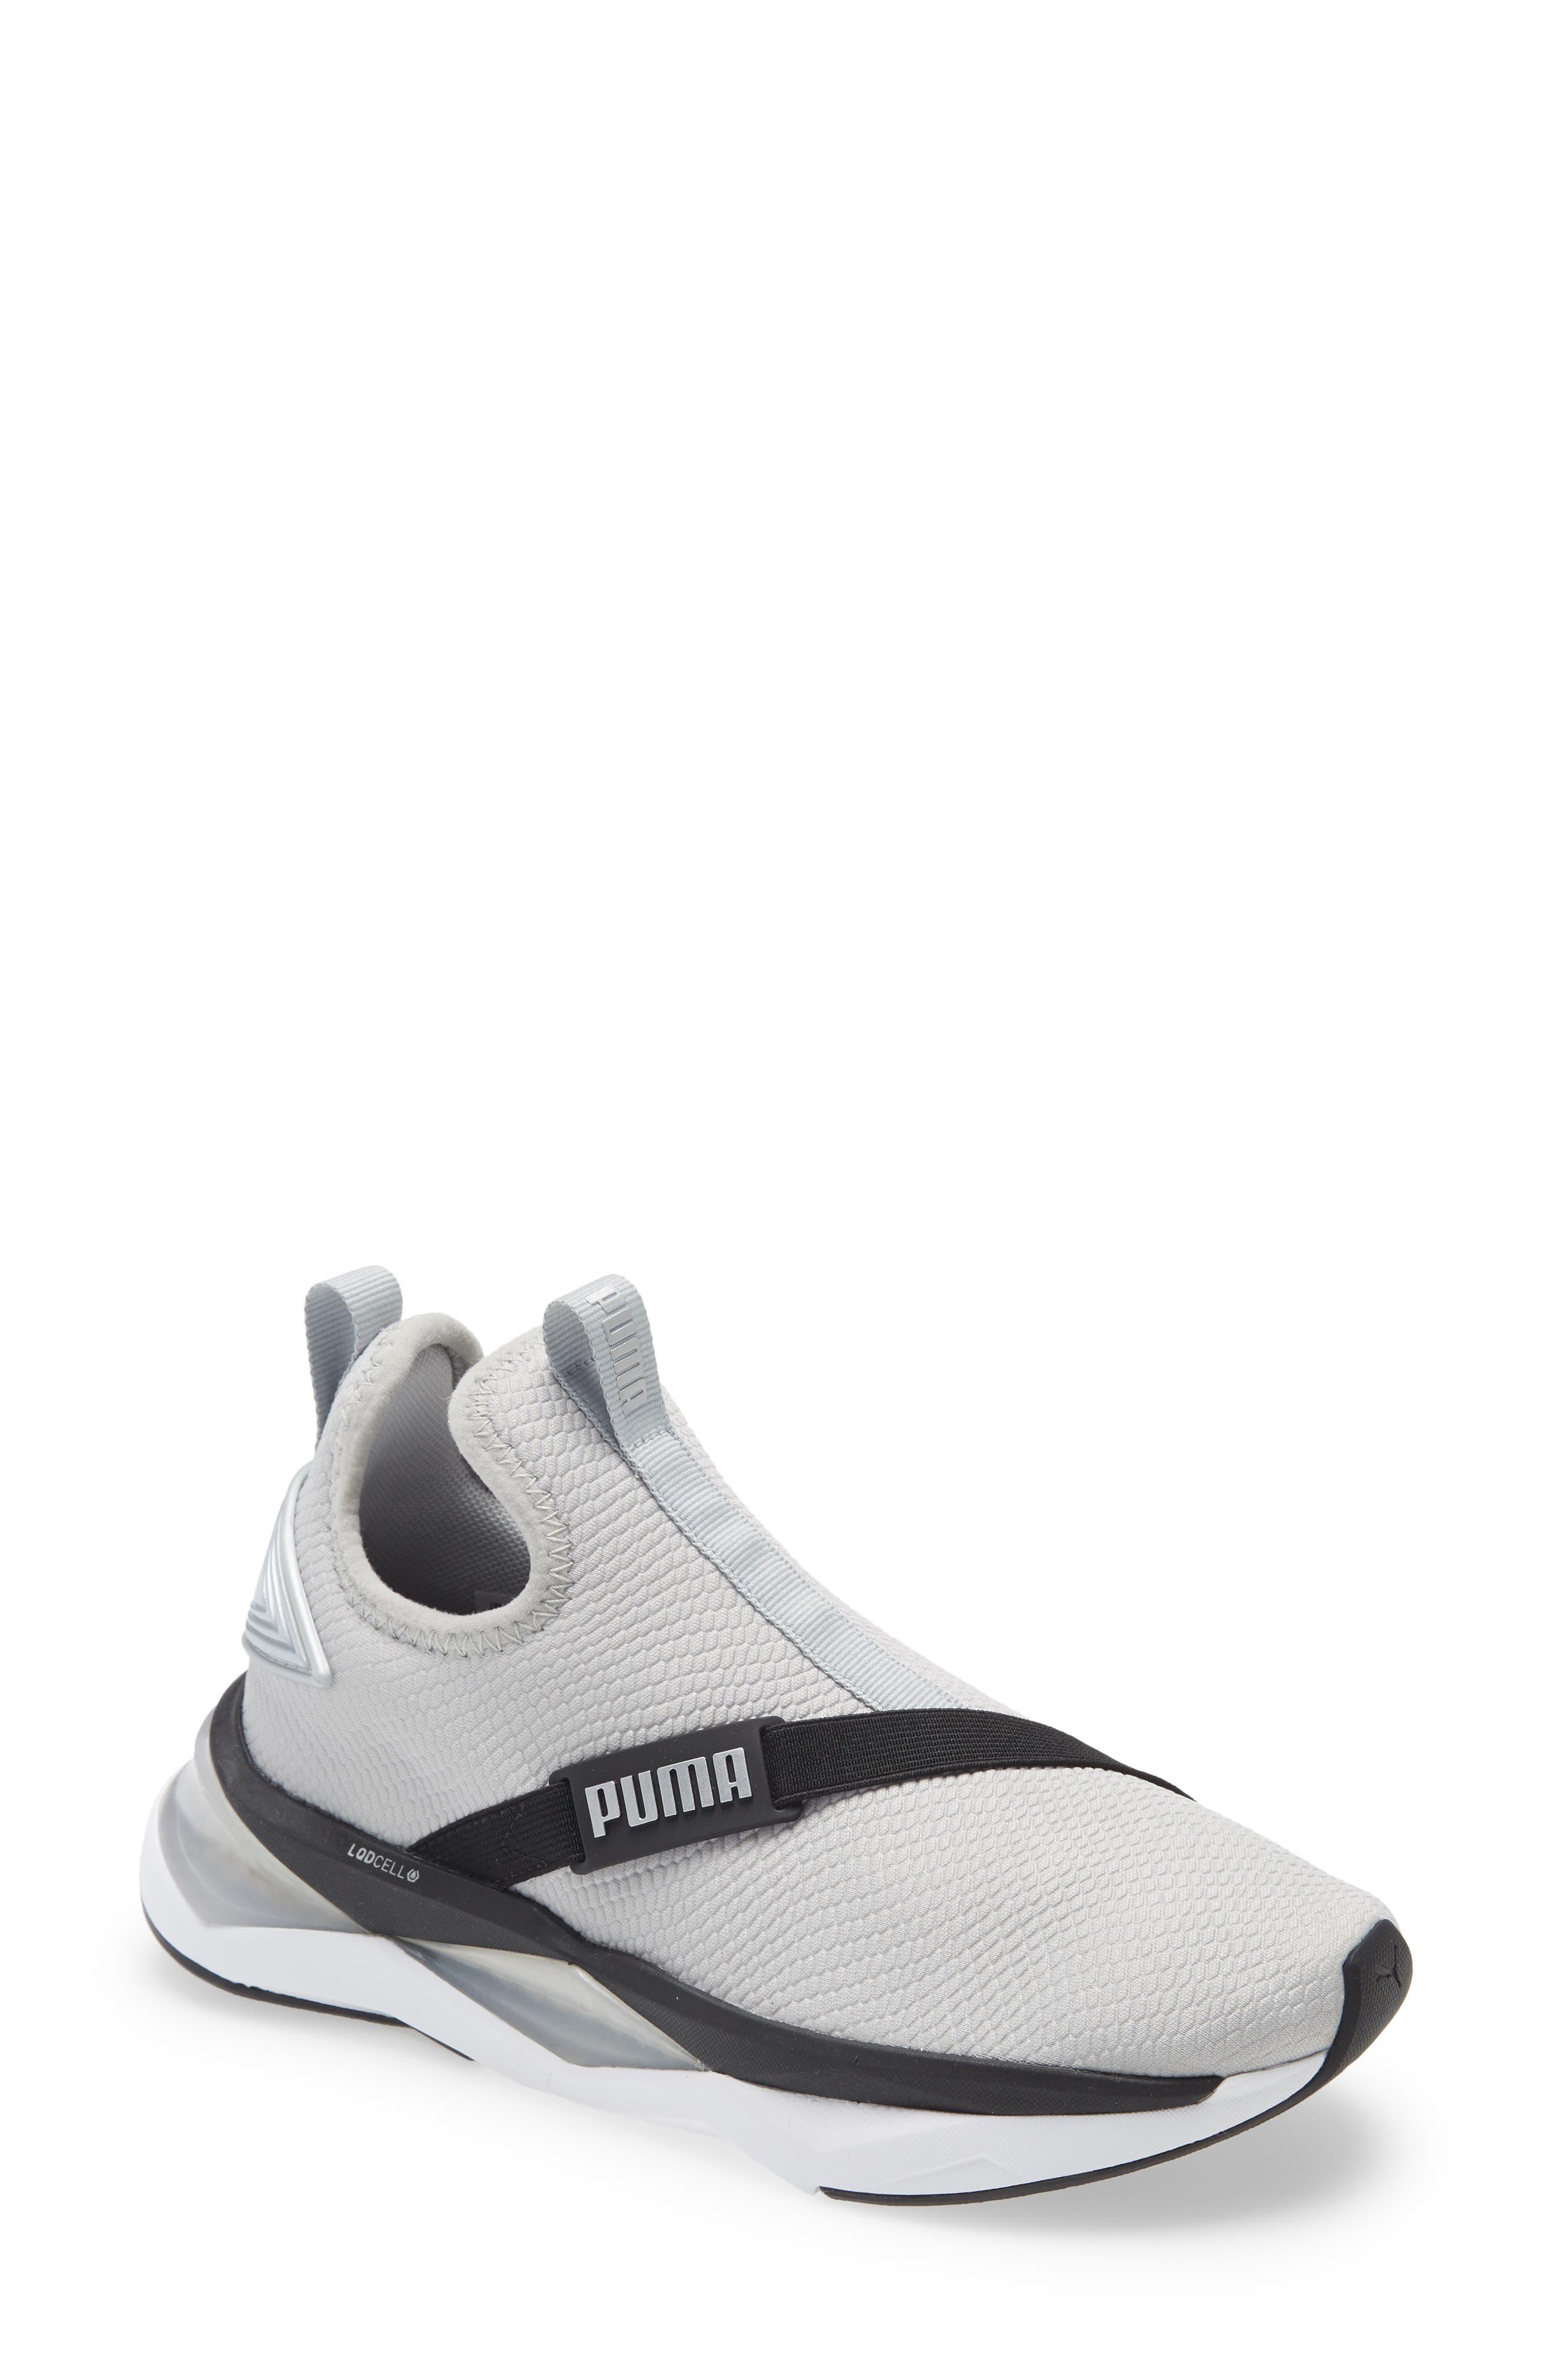 Women's PUMA Shoes | Nordstrom